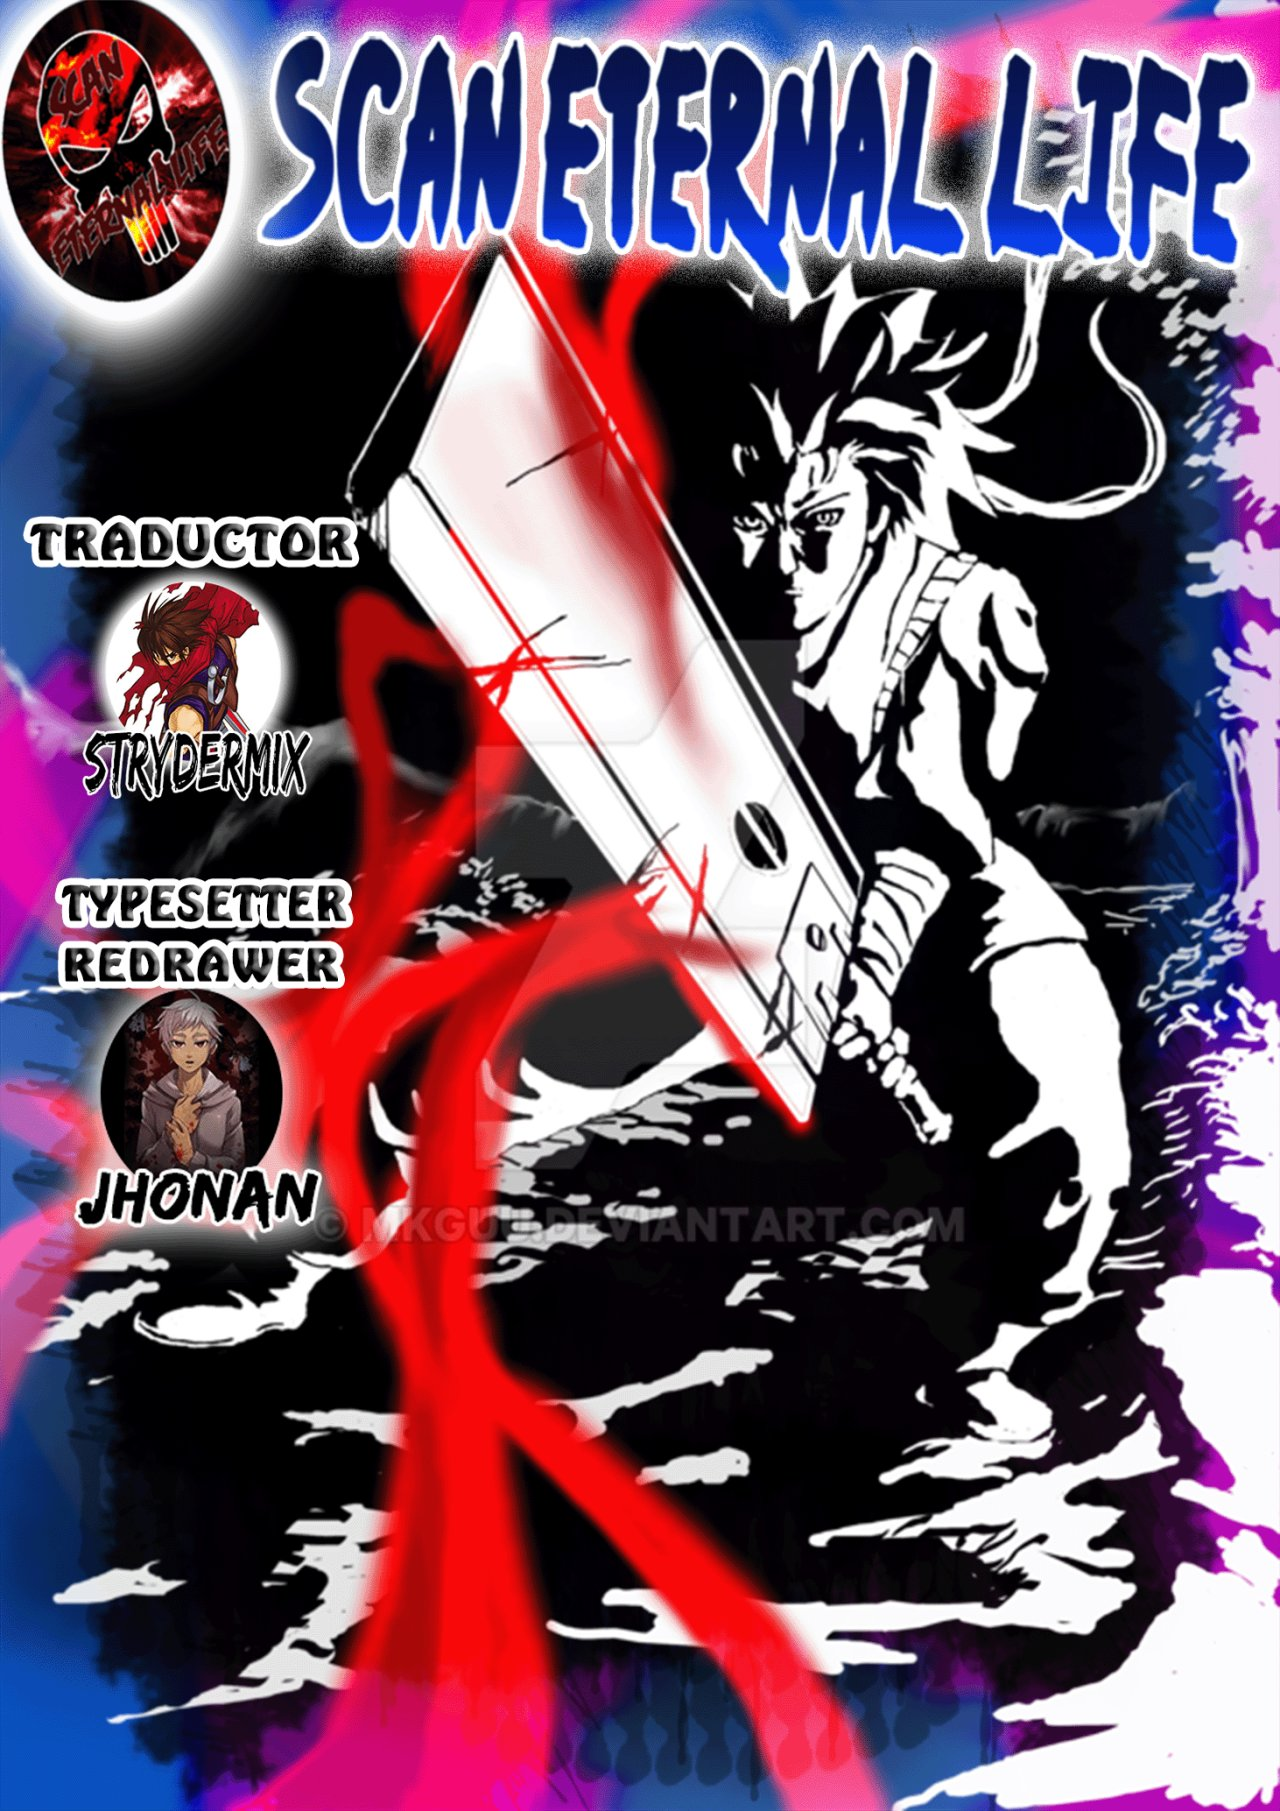 https://c10.mangatag.com/es_manga/pic5/10/14602/782704/e7d849ad71f30e44bed446ac00507f58.jpg Page 1